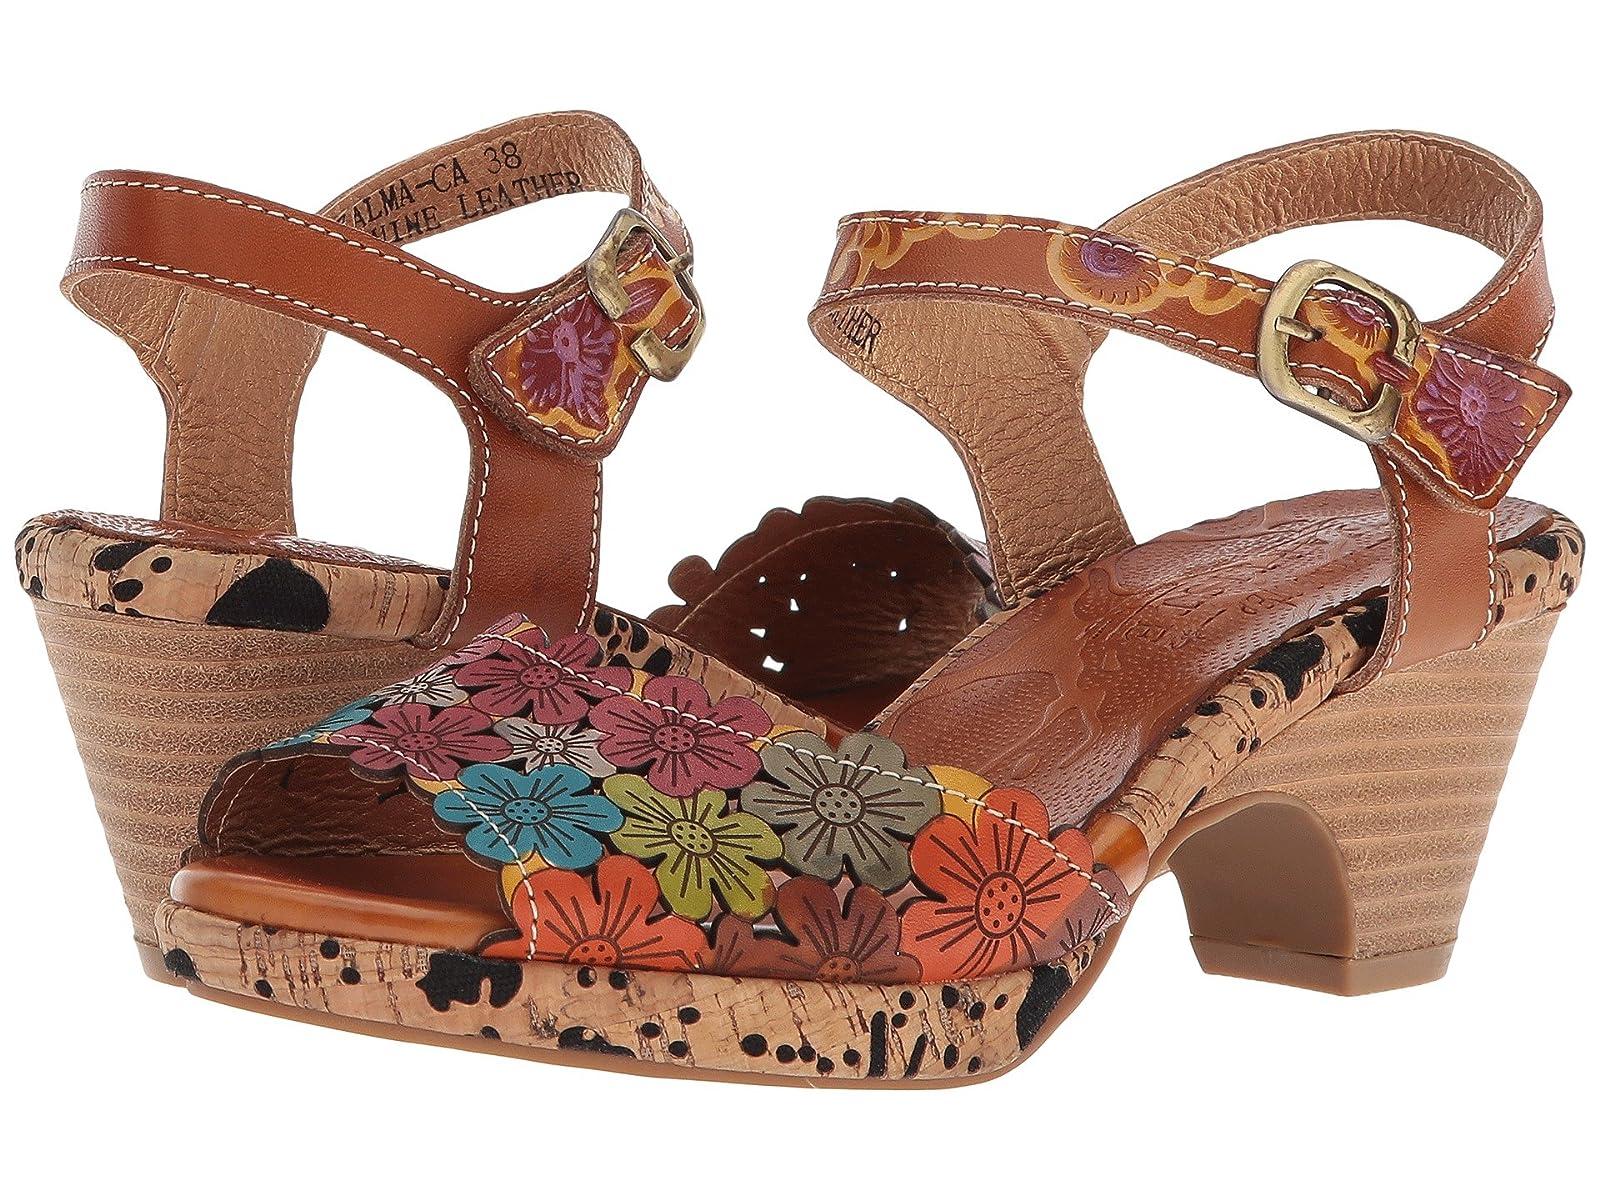 L'Artiste by Spring Step ZalmaAtmospheric grades have affordable shoes